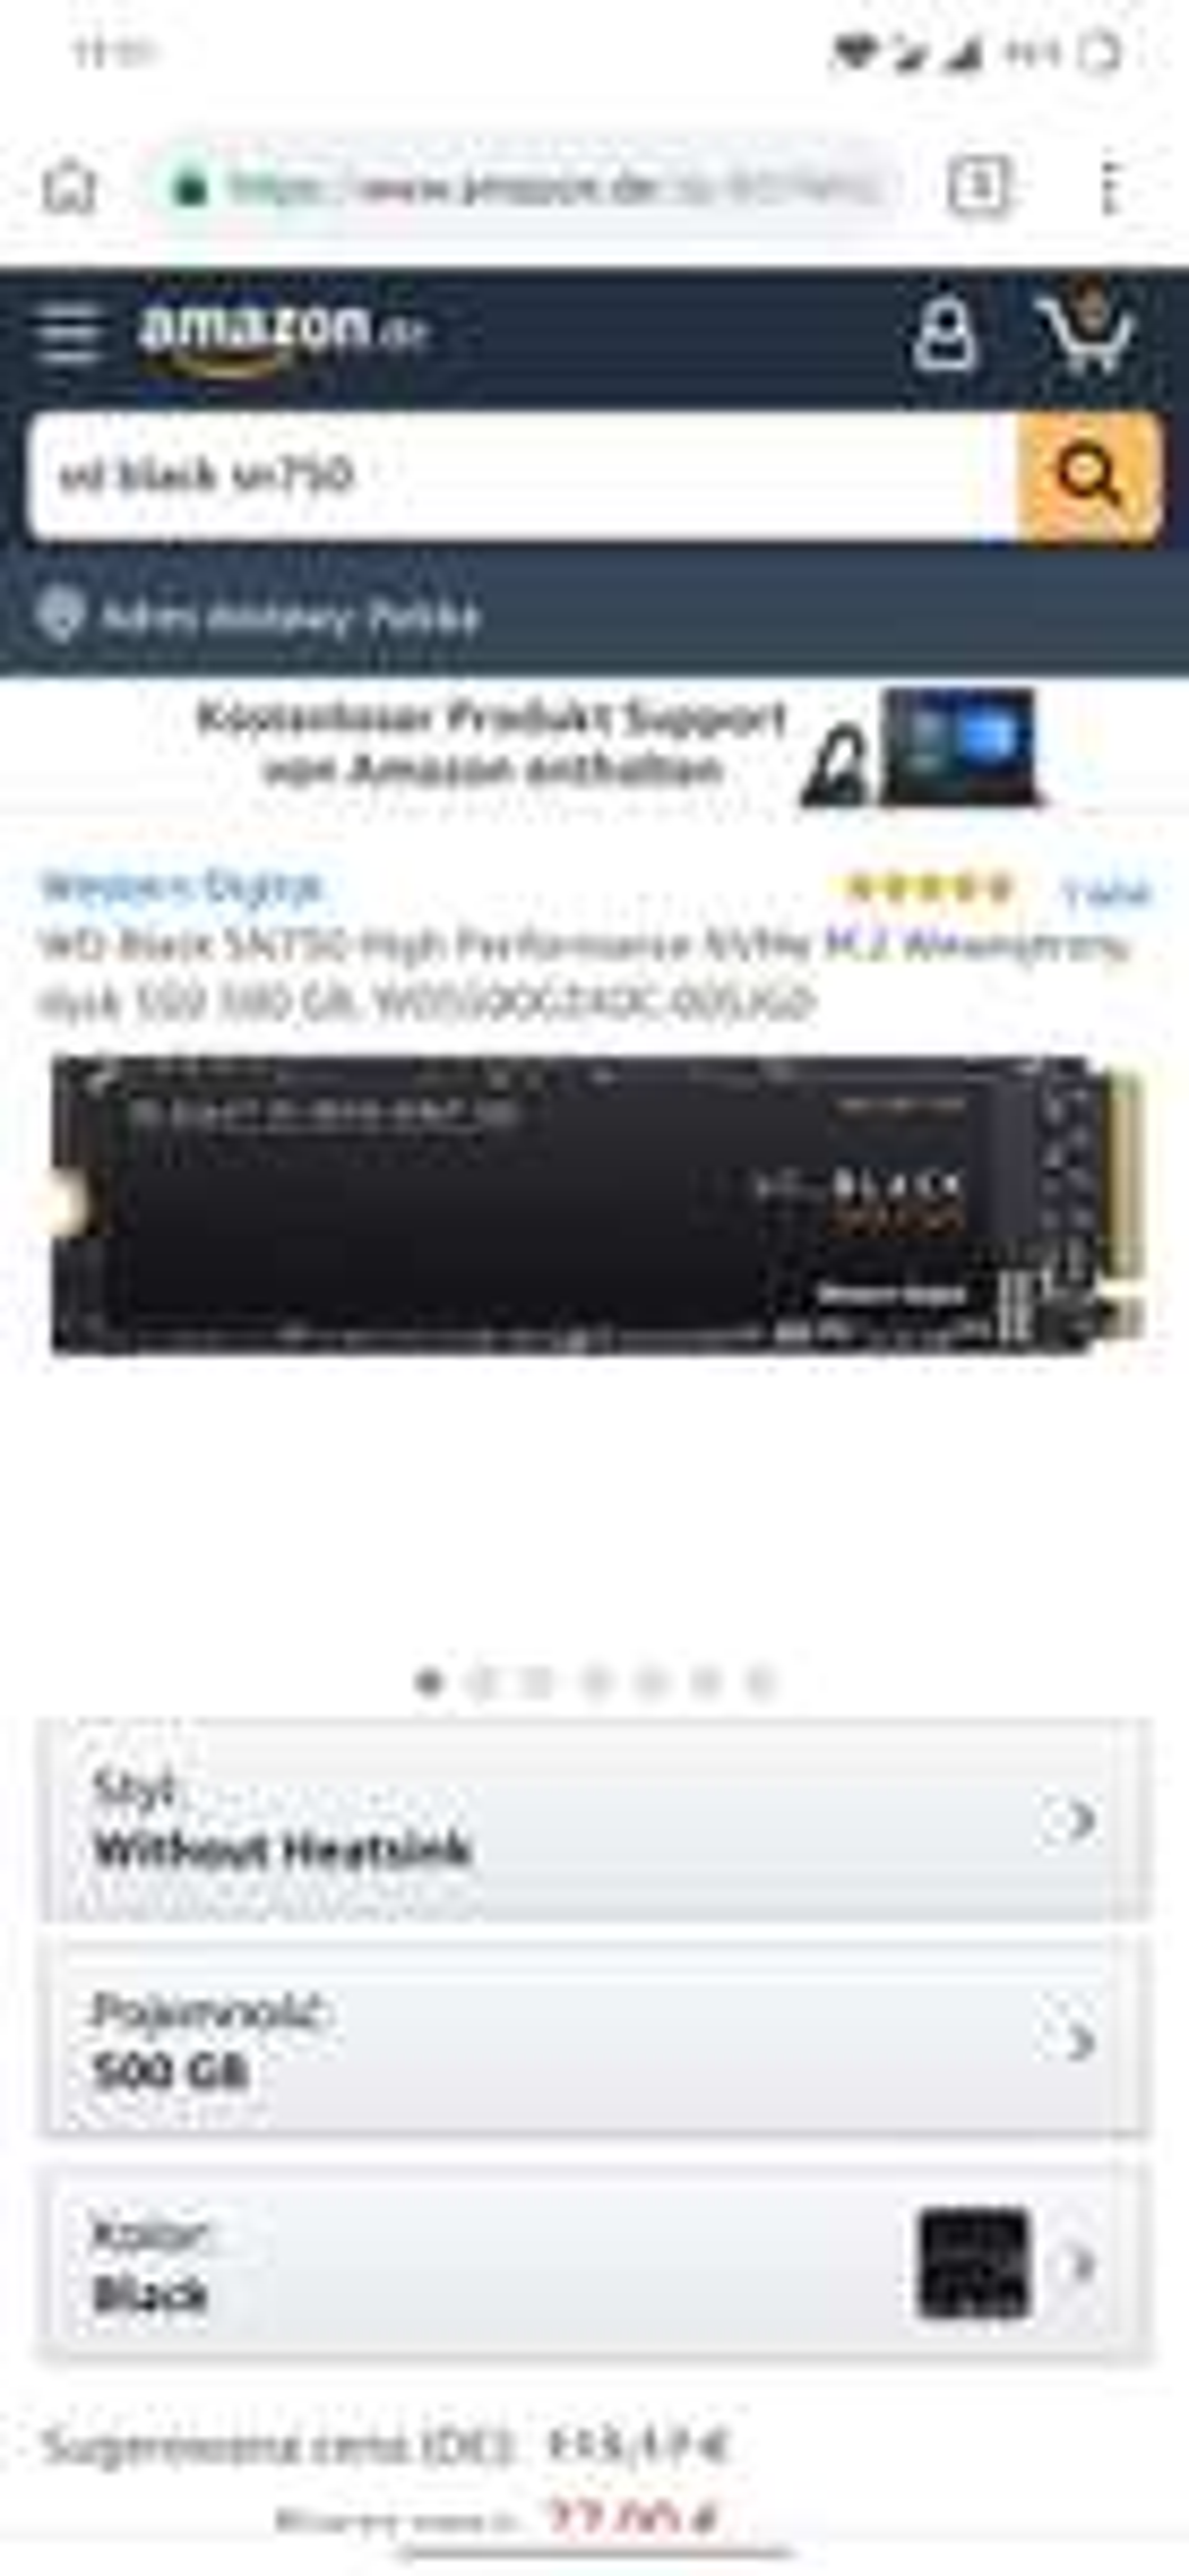 WD_BLACK SN750 NVMe™ SSD 500gb 82 euro